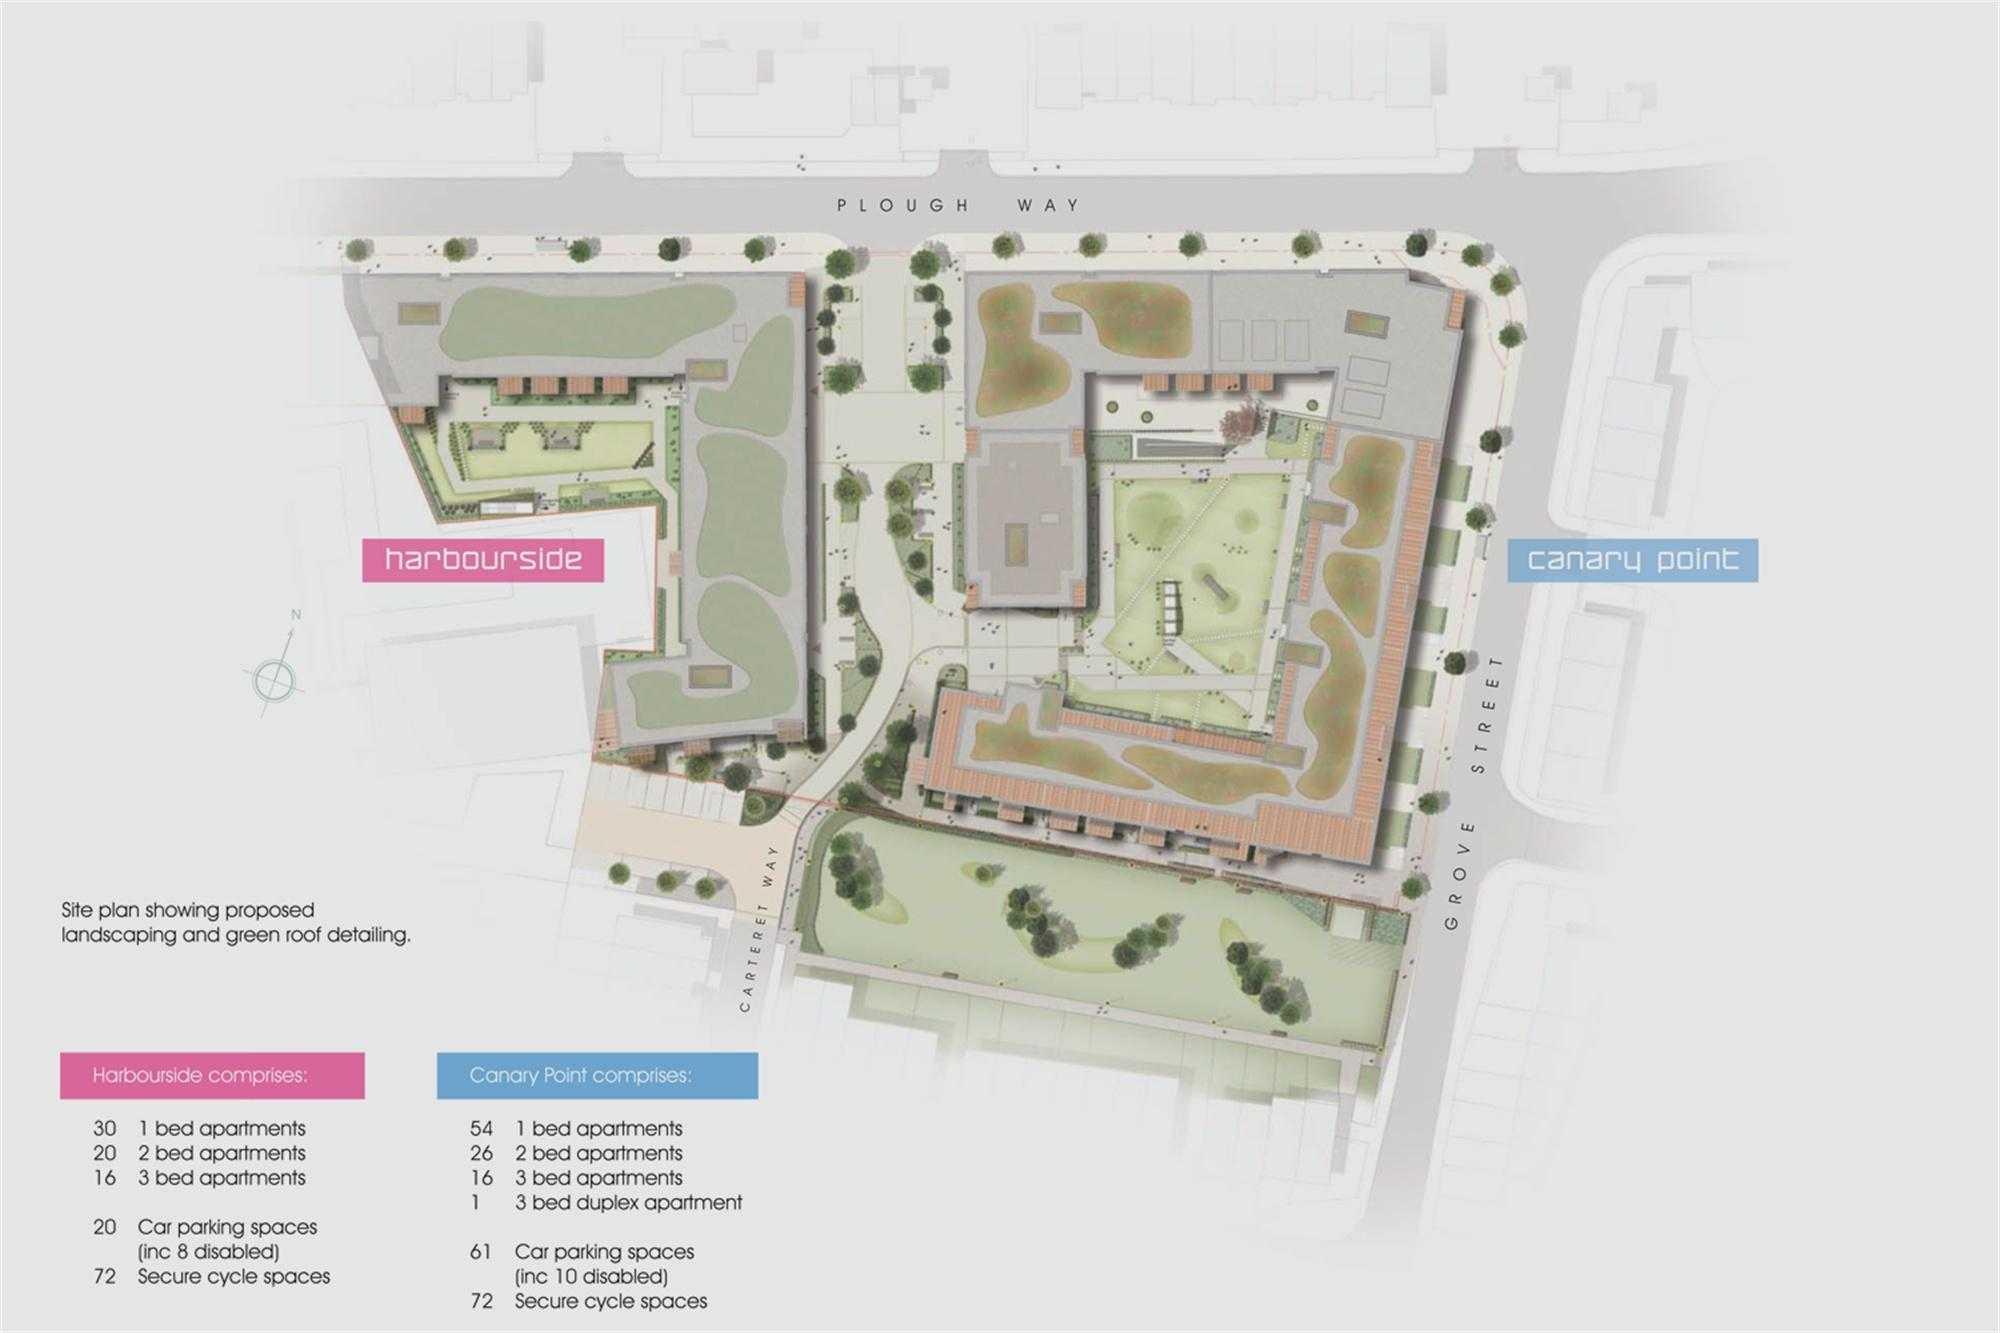 marina-wharf-london-site-plan